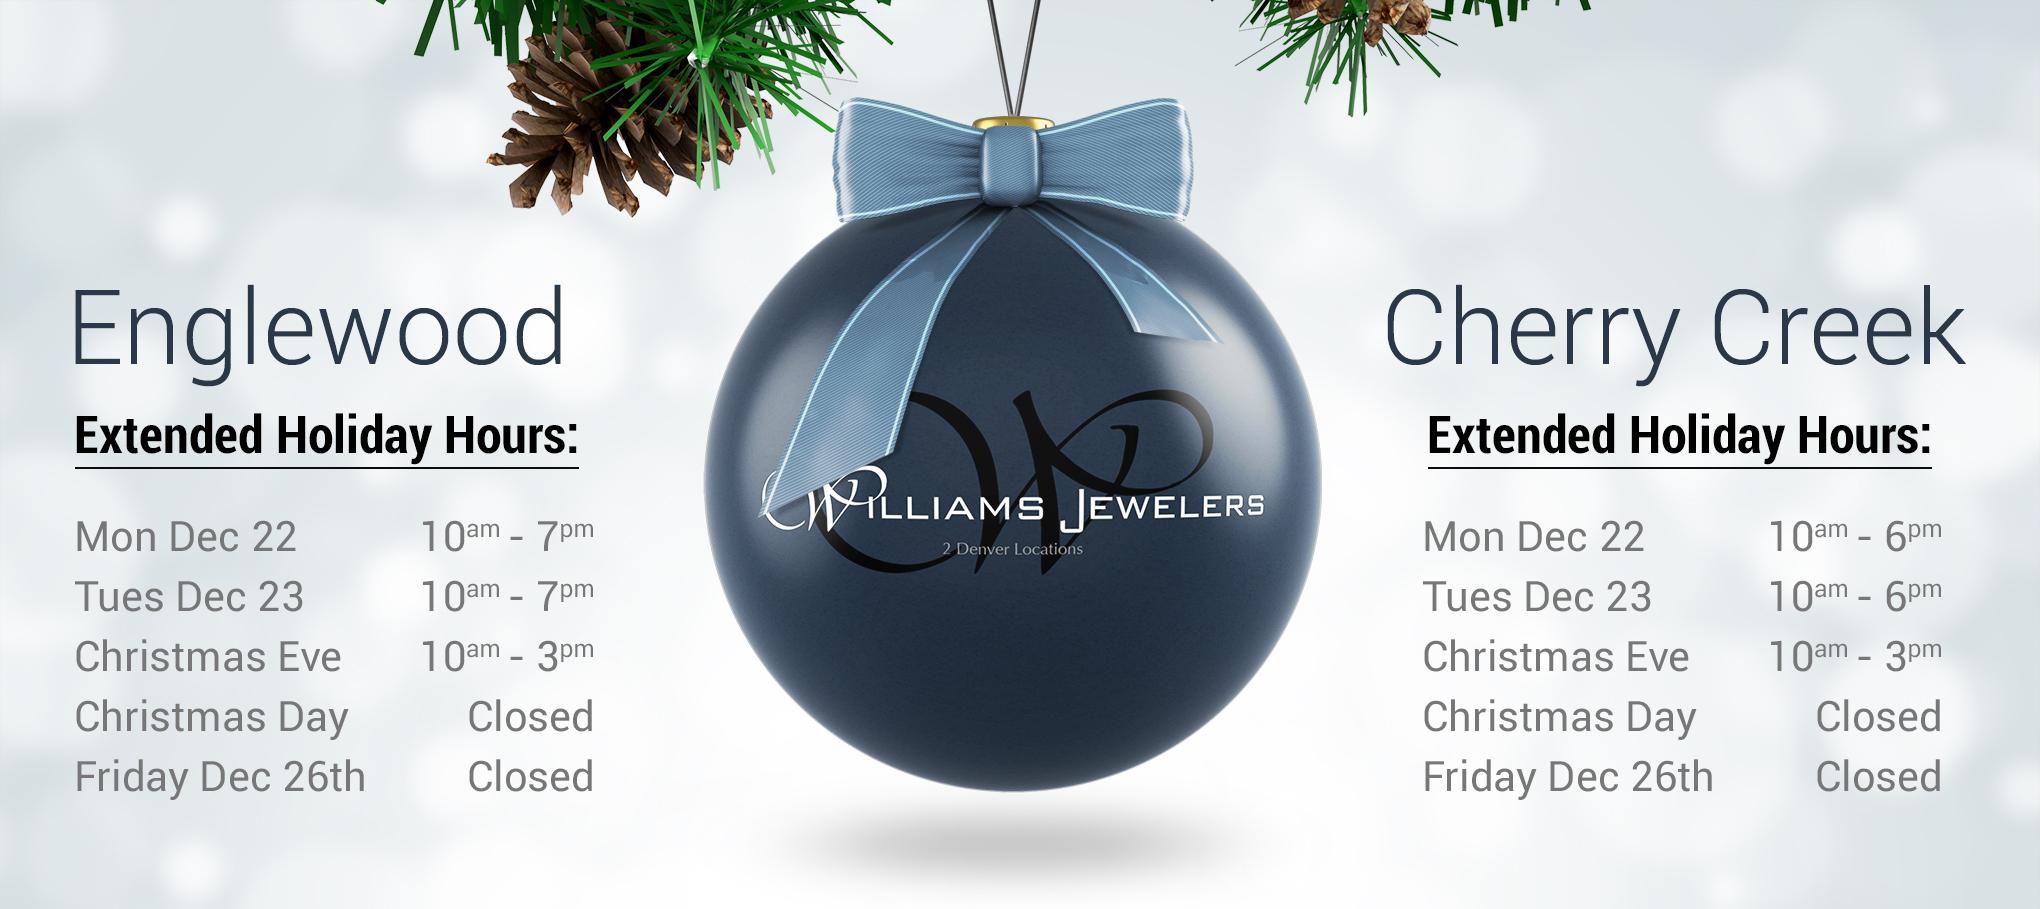 Williams Jewelers of Denver, Colorado